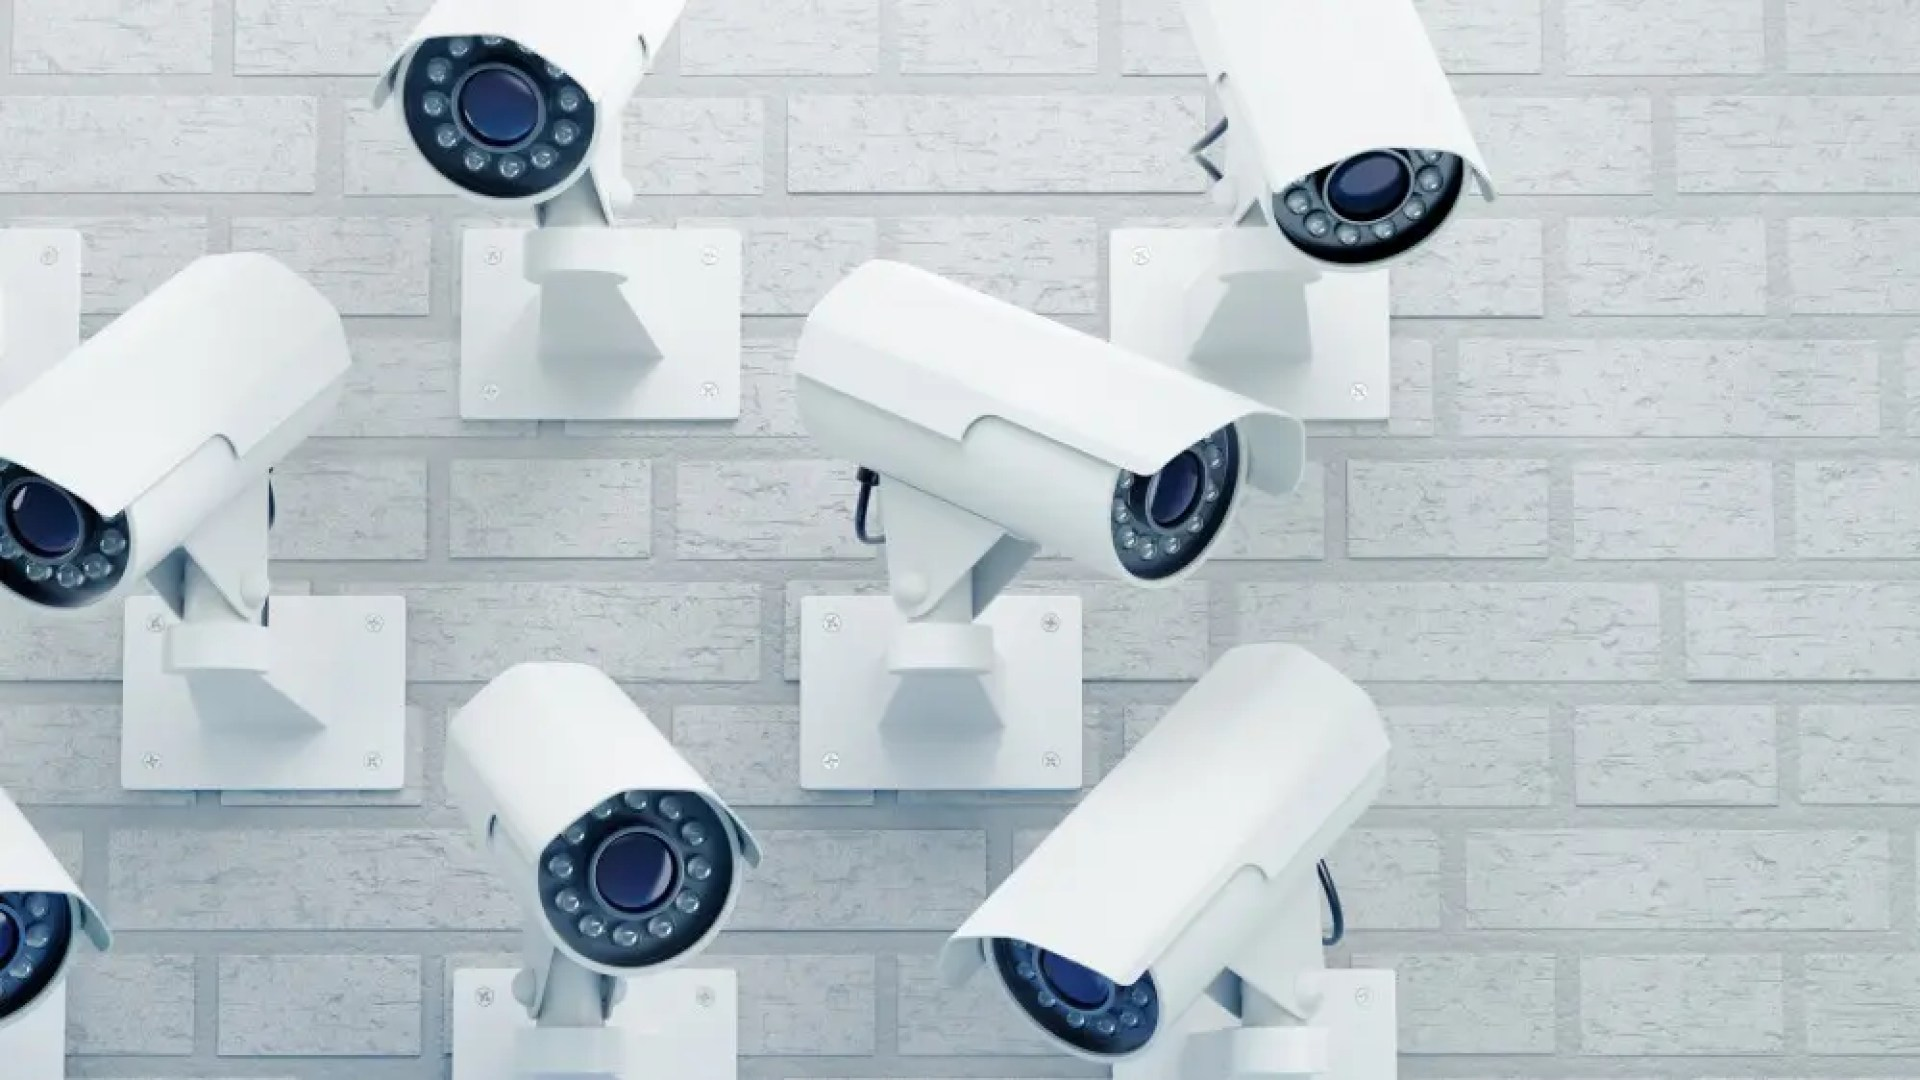 Group of external surveillance cameras mounted on a brick wall.